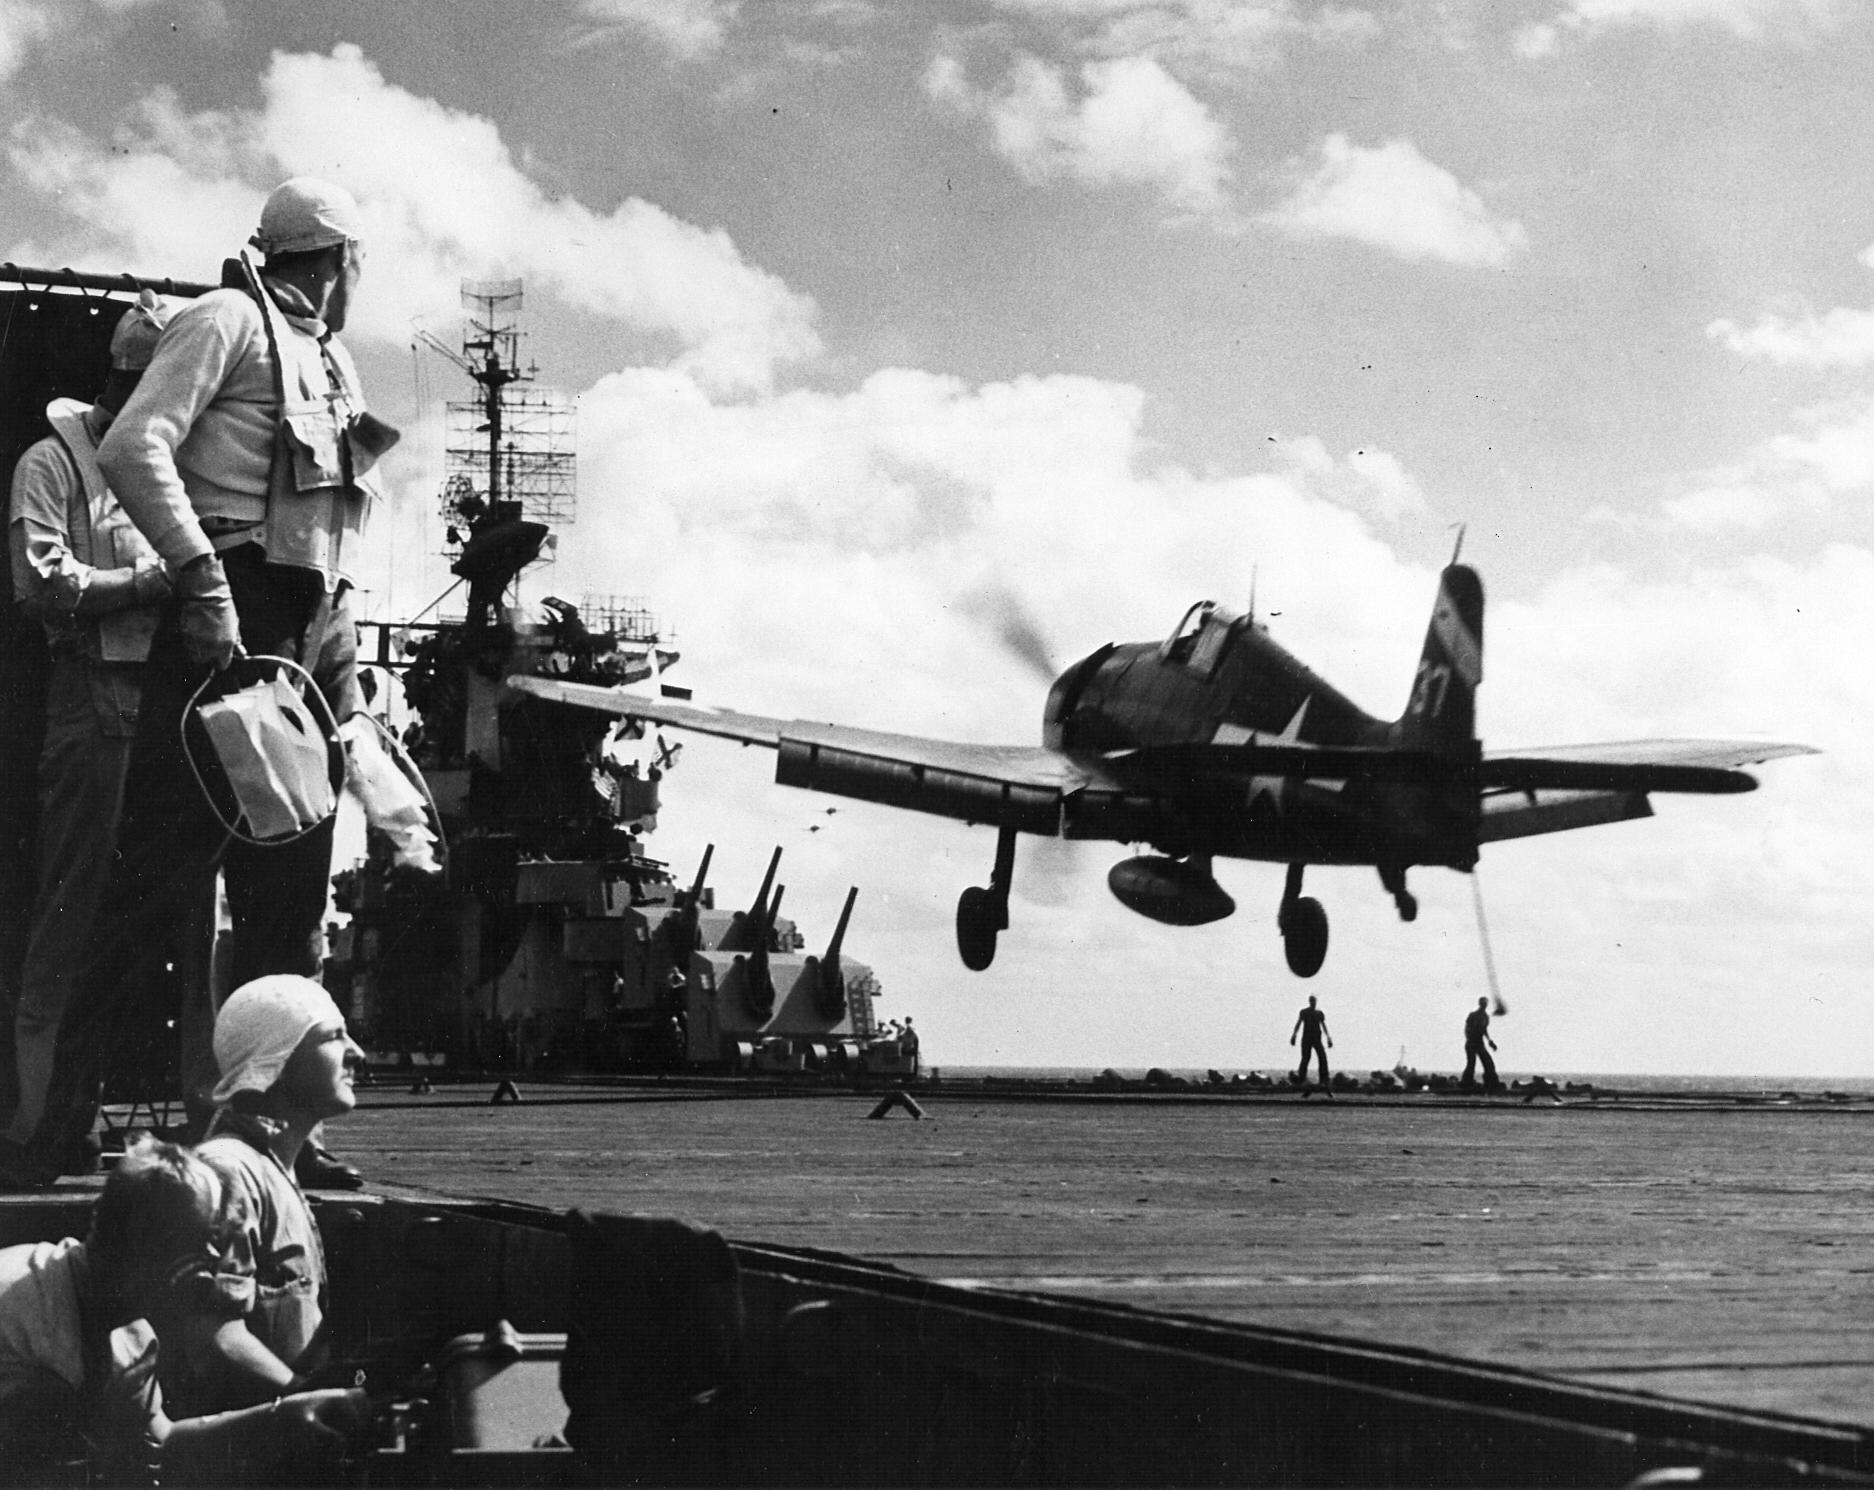 Grumman F6F 5 Hellcat VF 6 White 37 landing aboard CV 19 USS Hancock 01